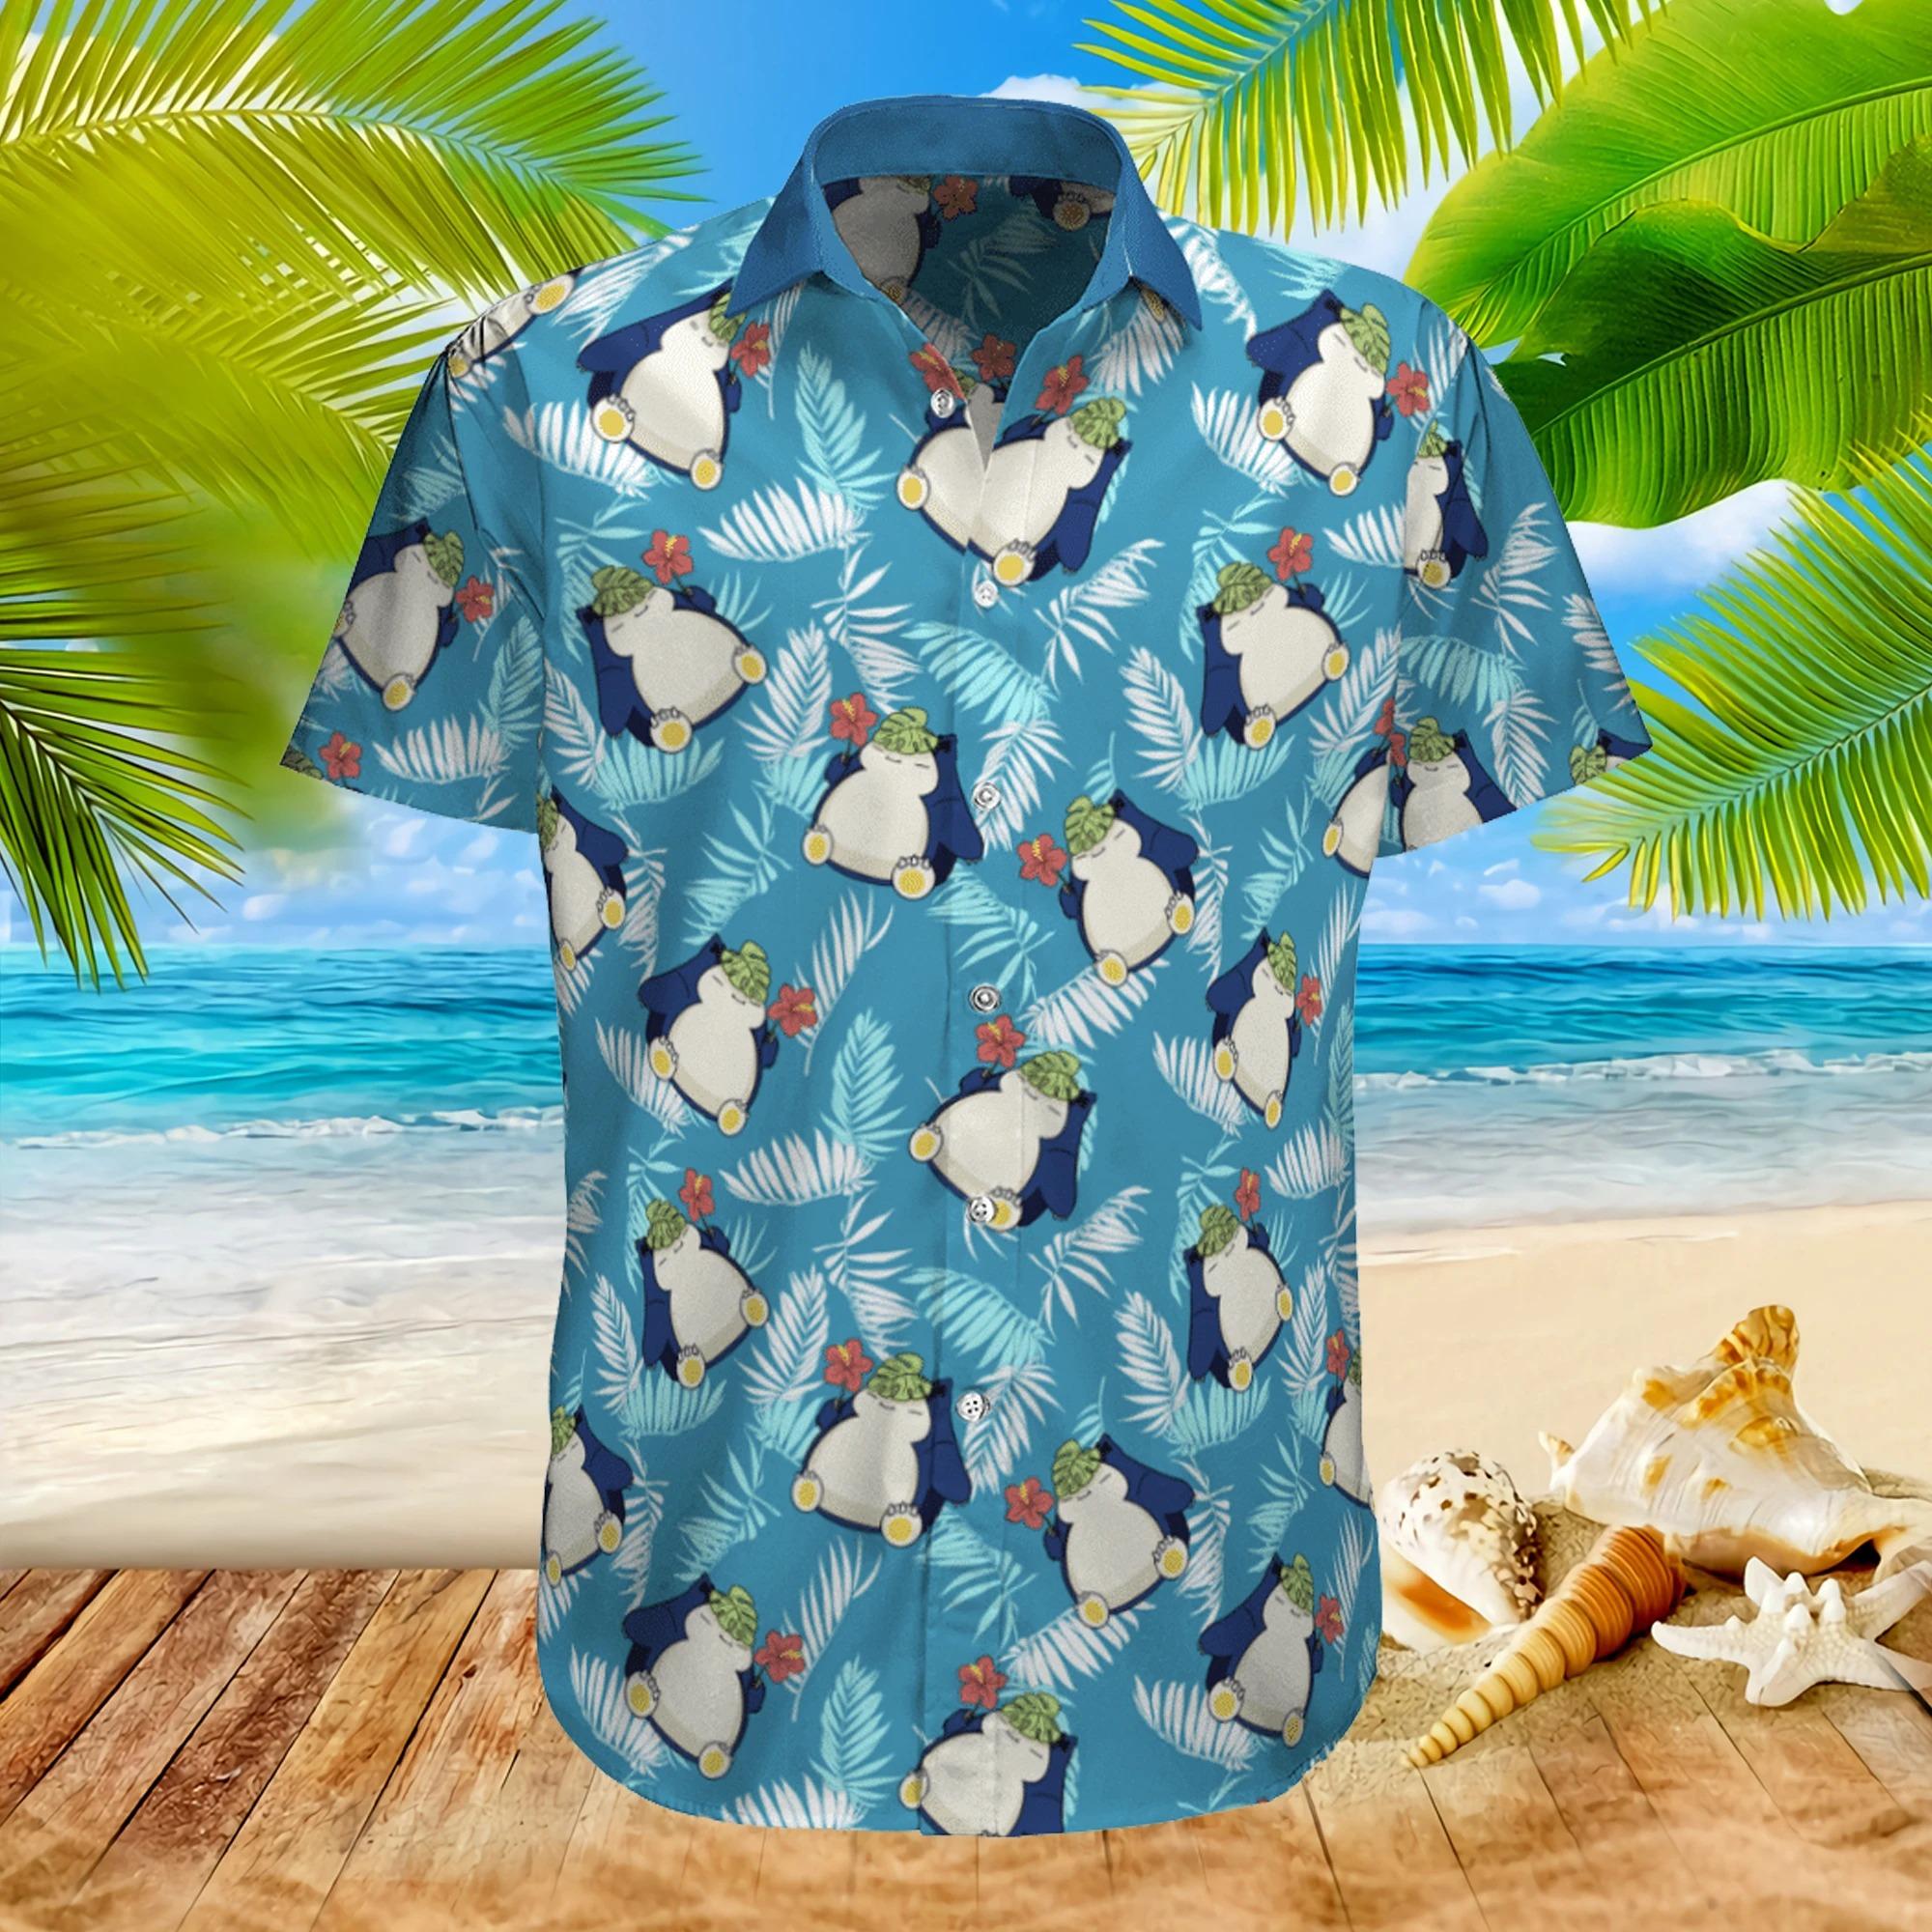 Pokemon Snorlax tropical beach hawaiian shirt